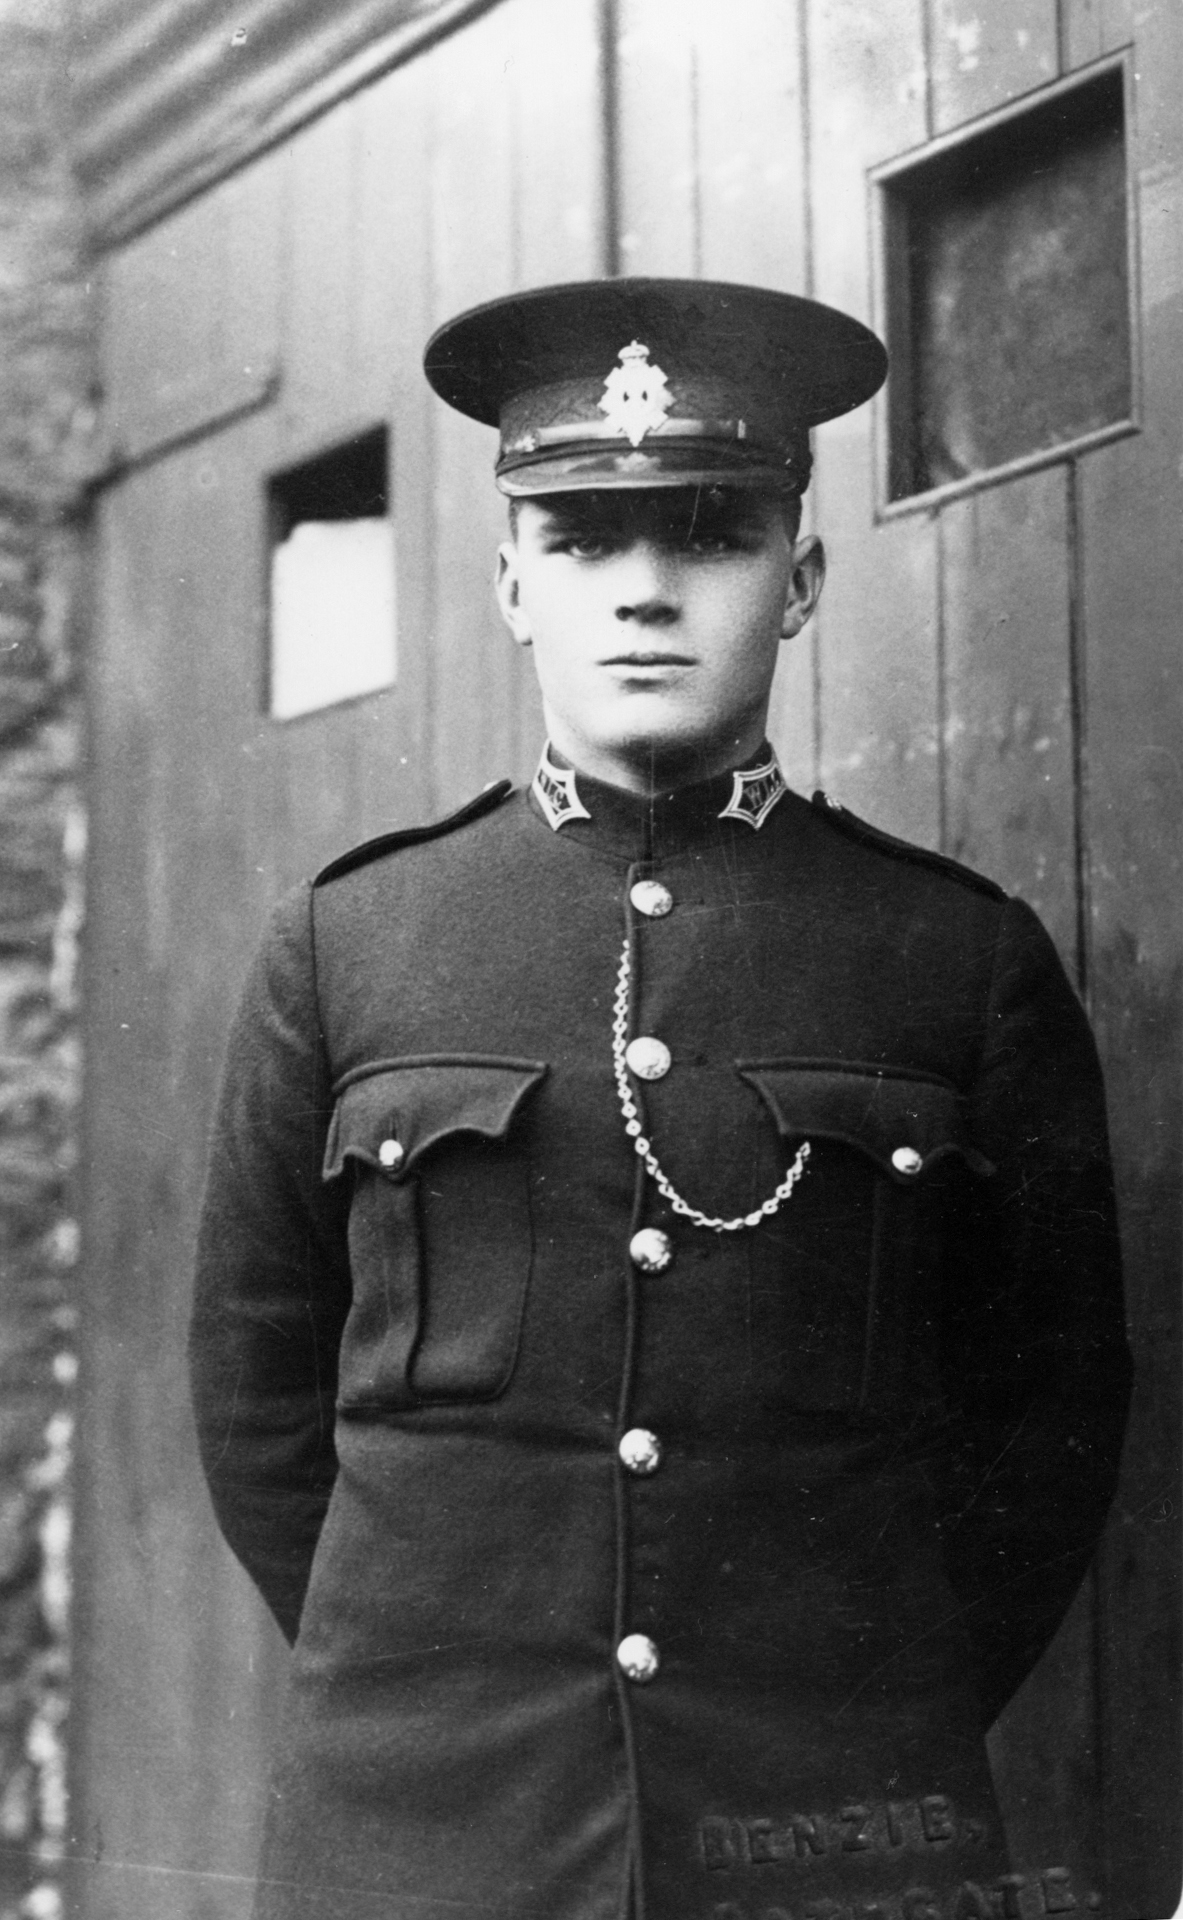 Policeman On Duty c.1930